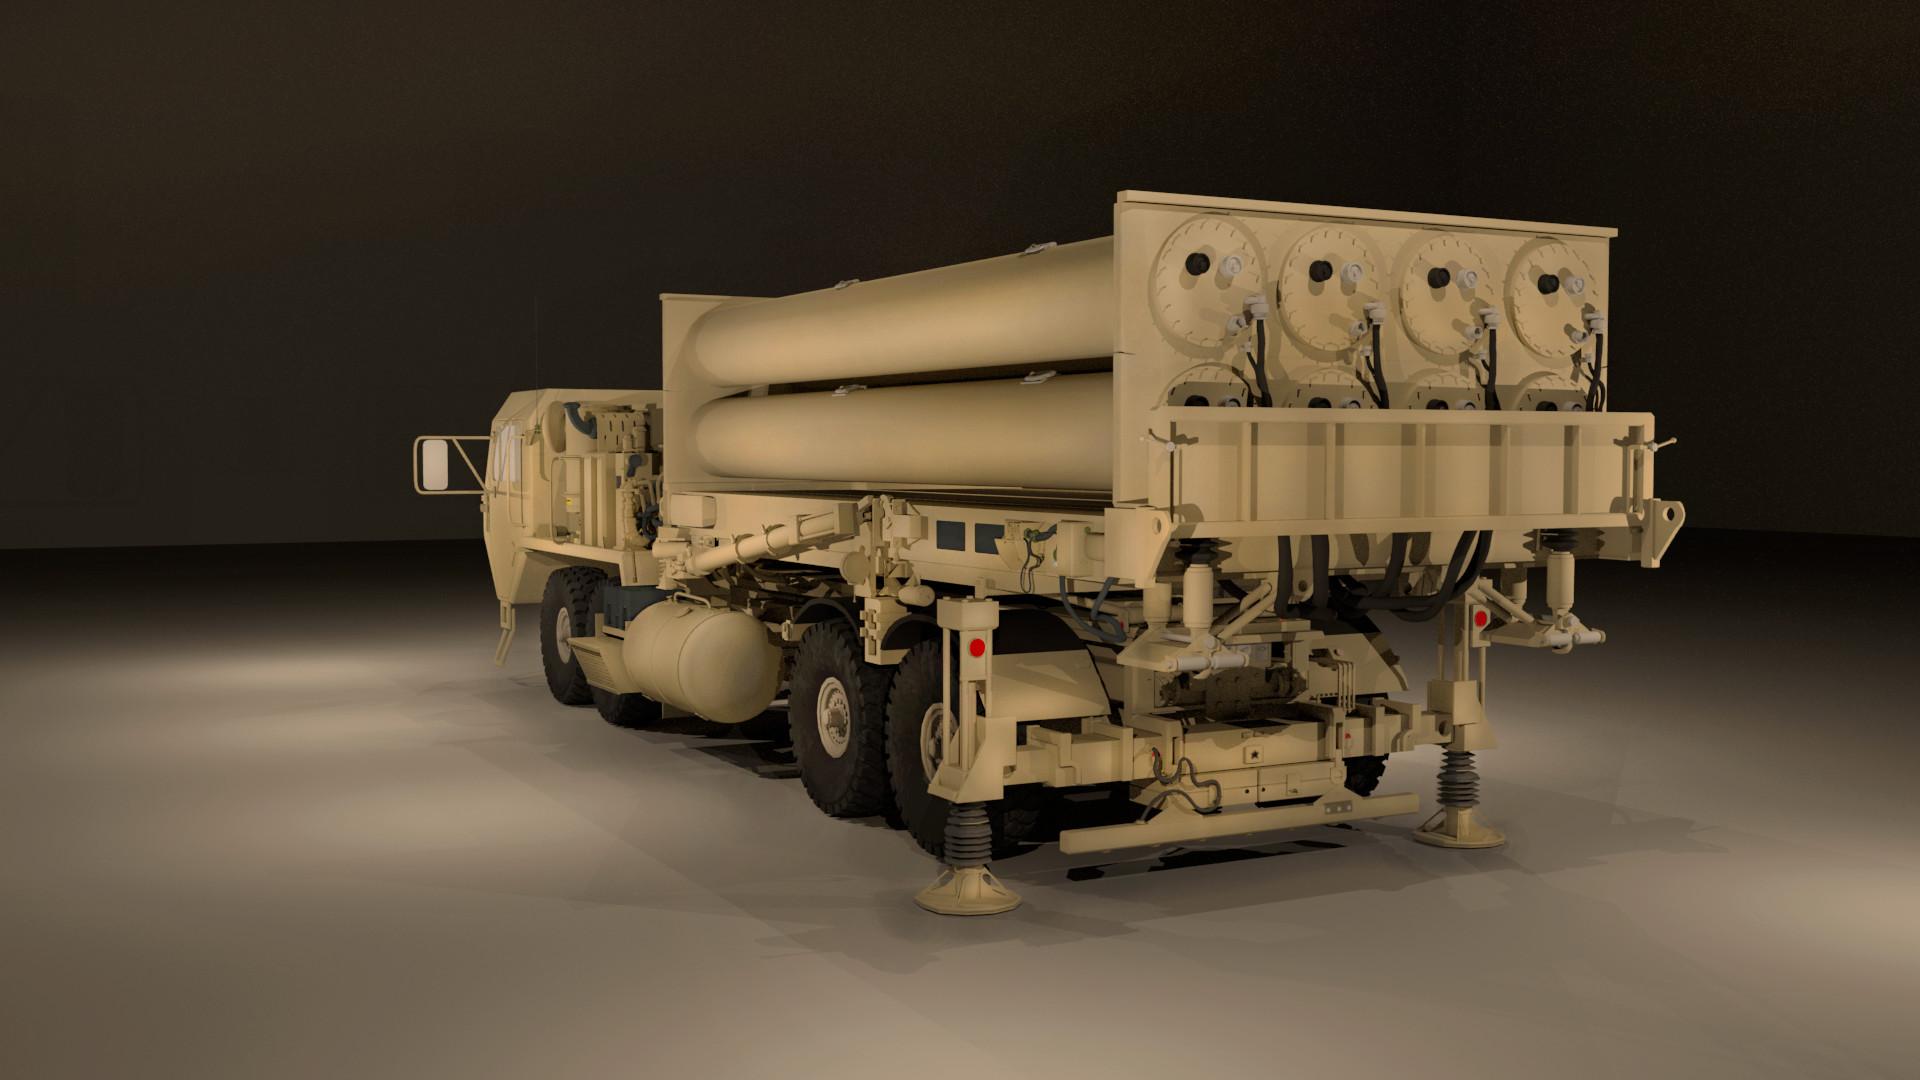 Kimberly Macneil Thaad Rocket Launcher